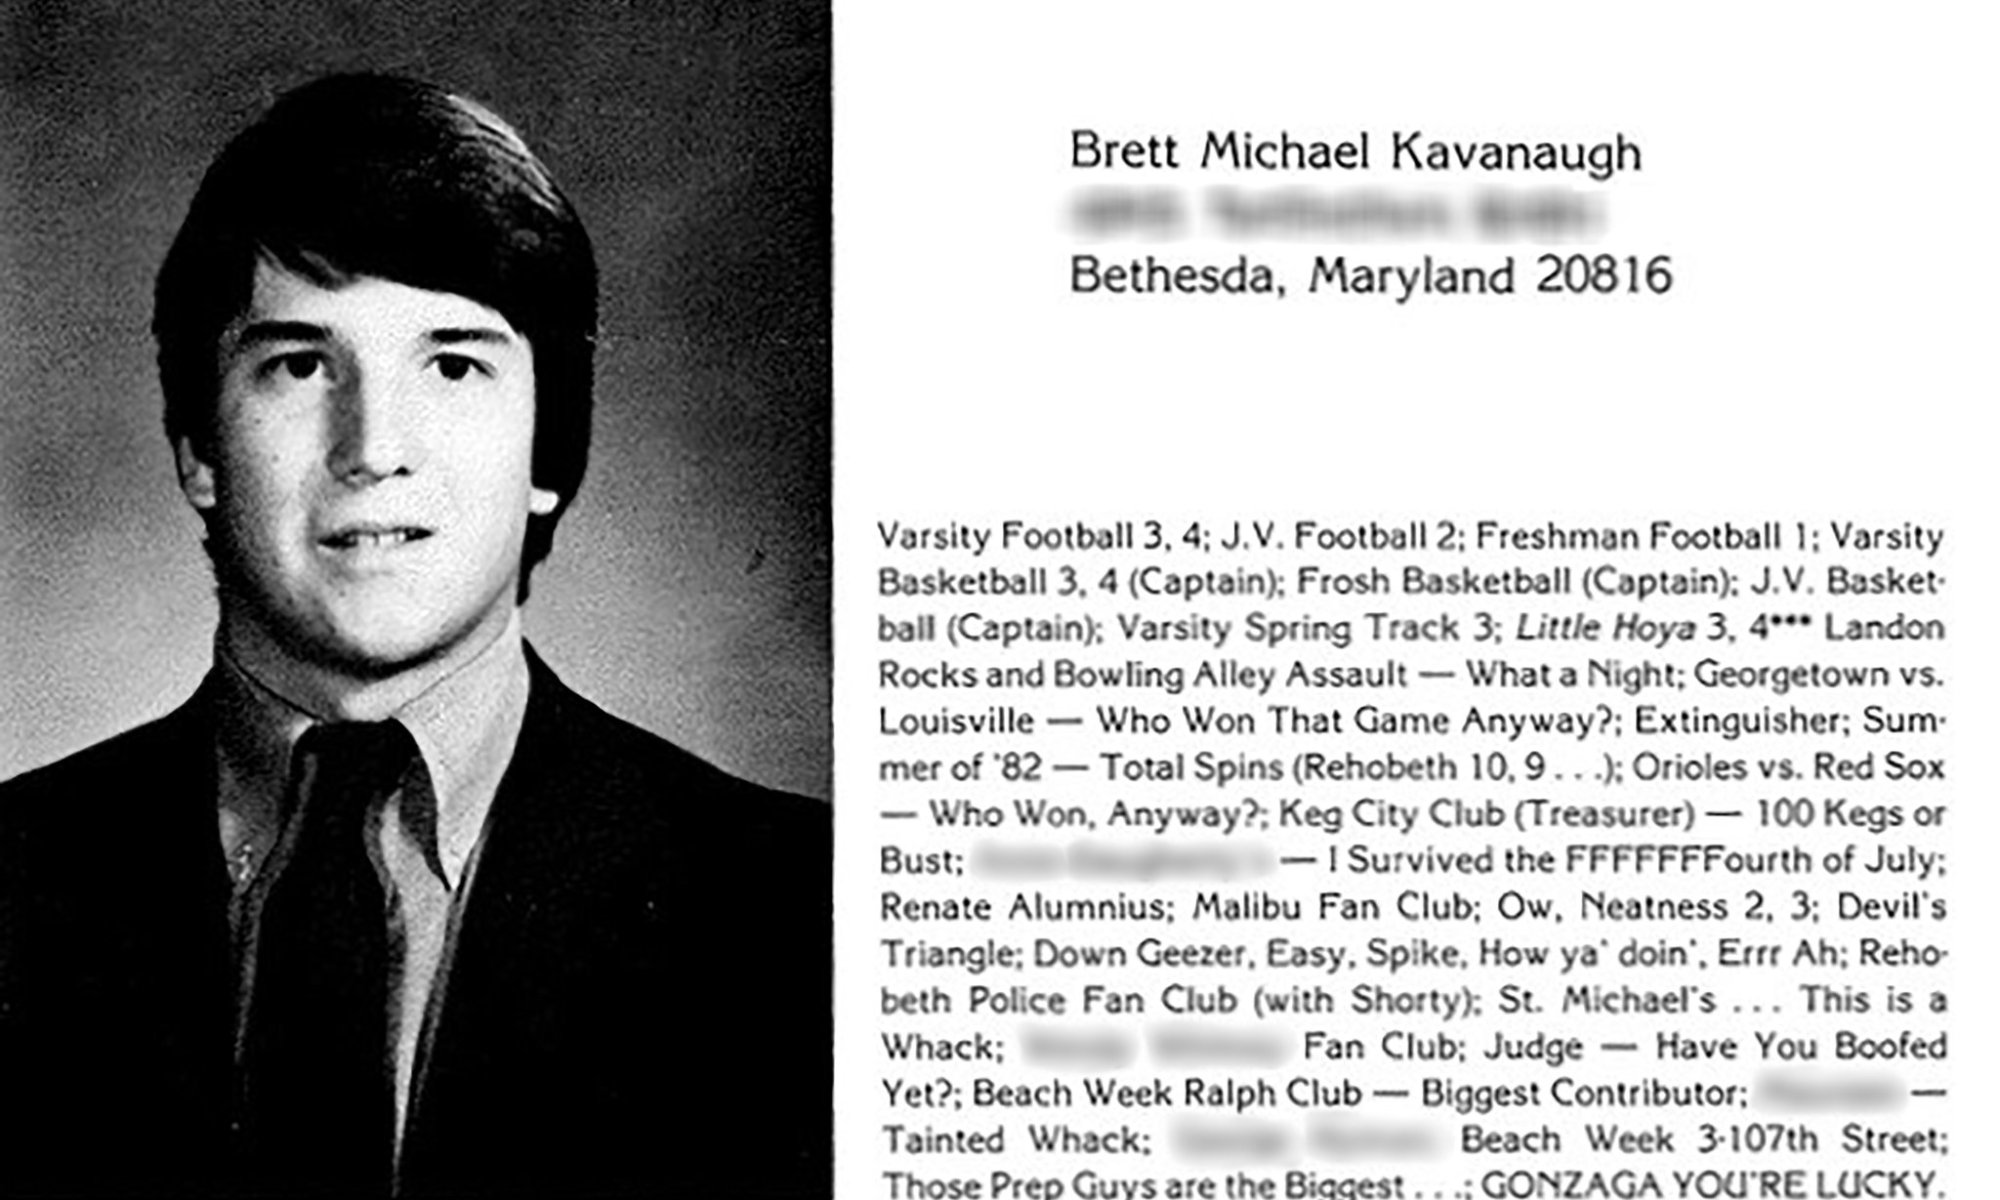 Brett Kavanaugh Archives - Opening Arguments